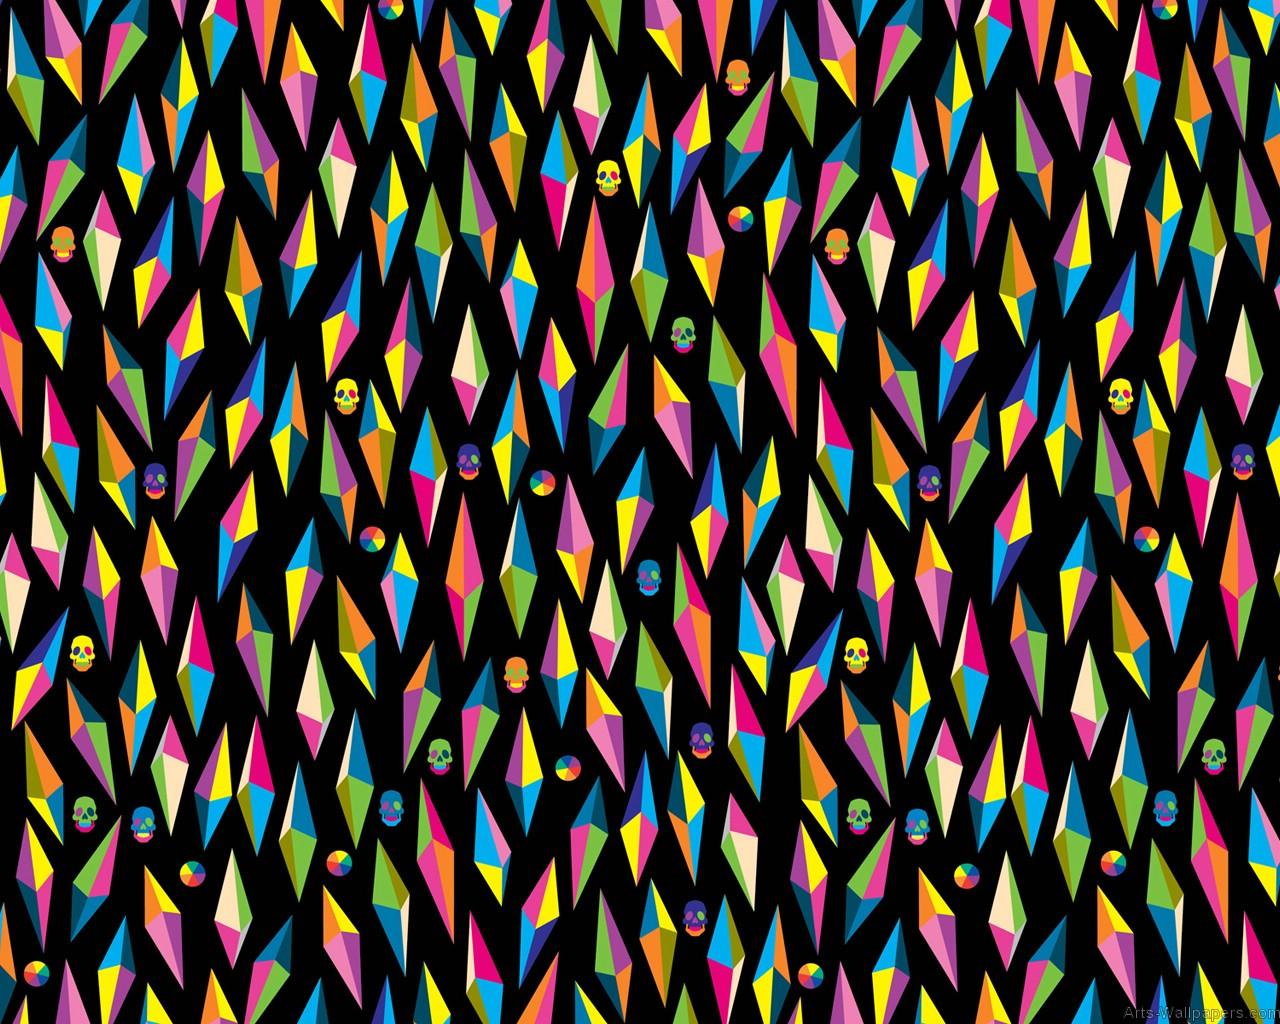 Graphic Design Art Wallpapers 1280 x 1024 1280x1024